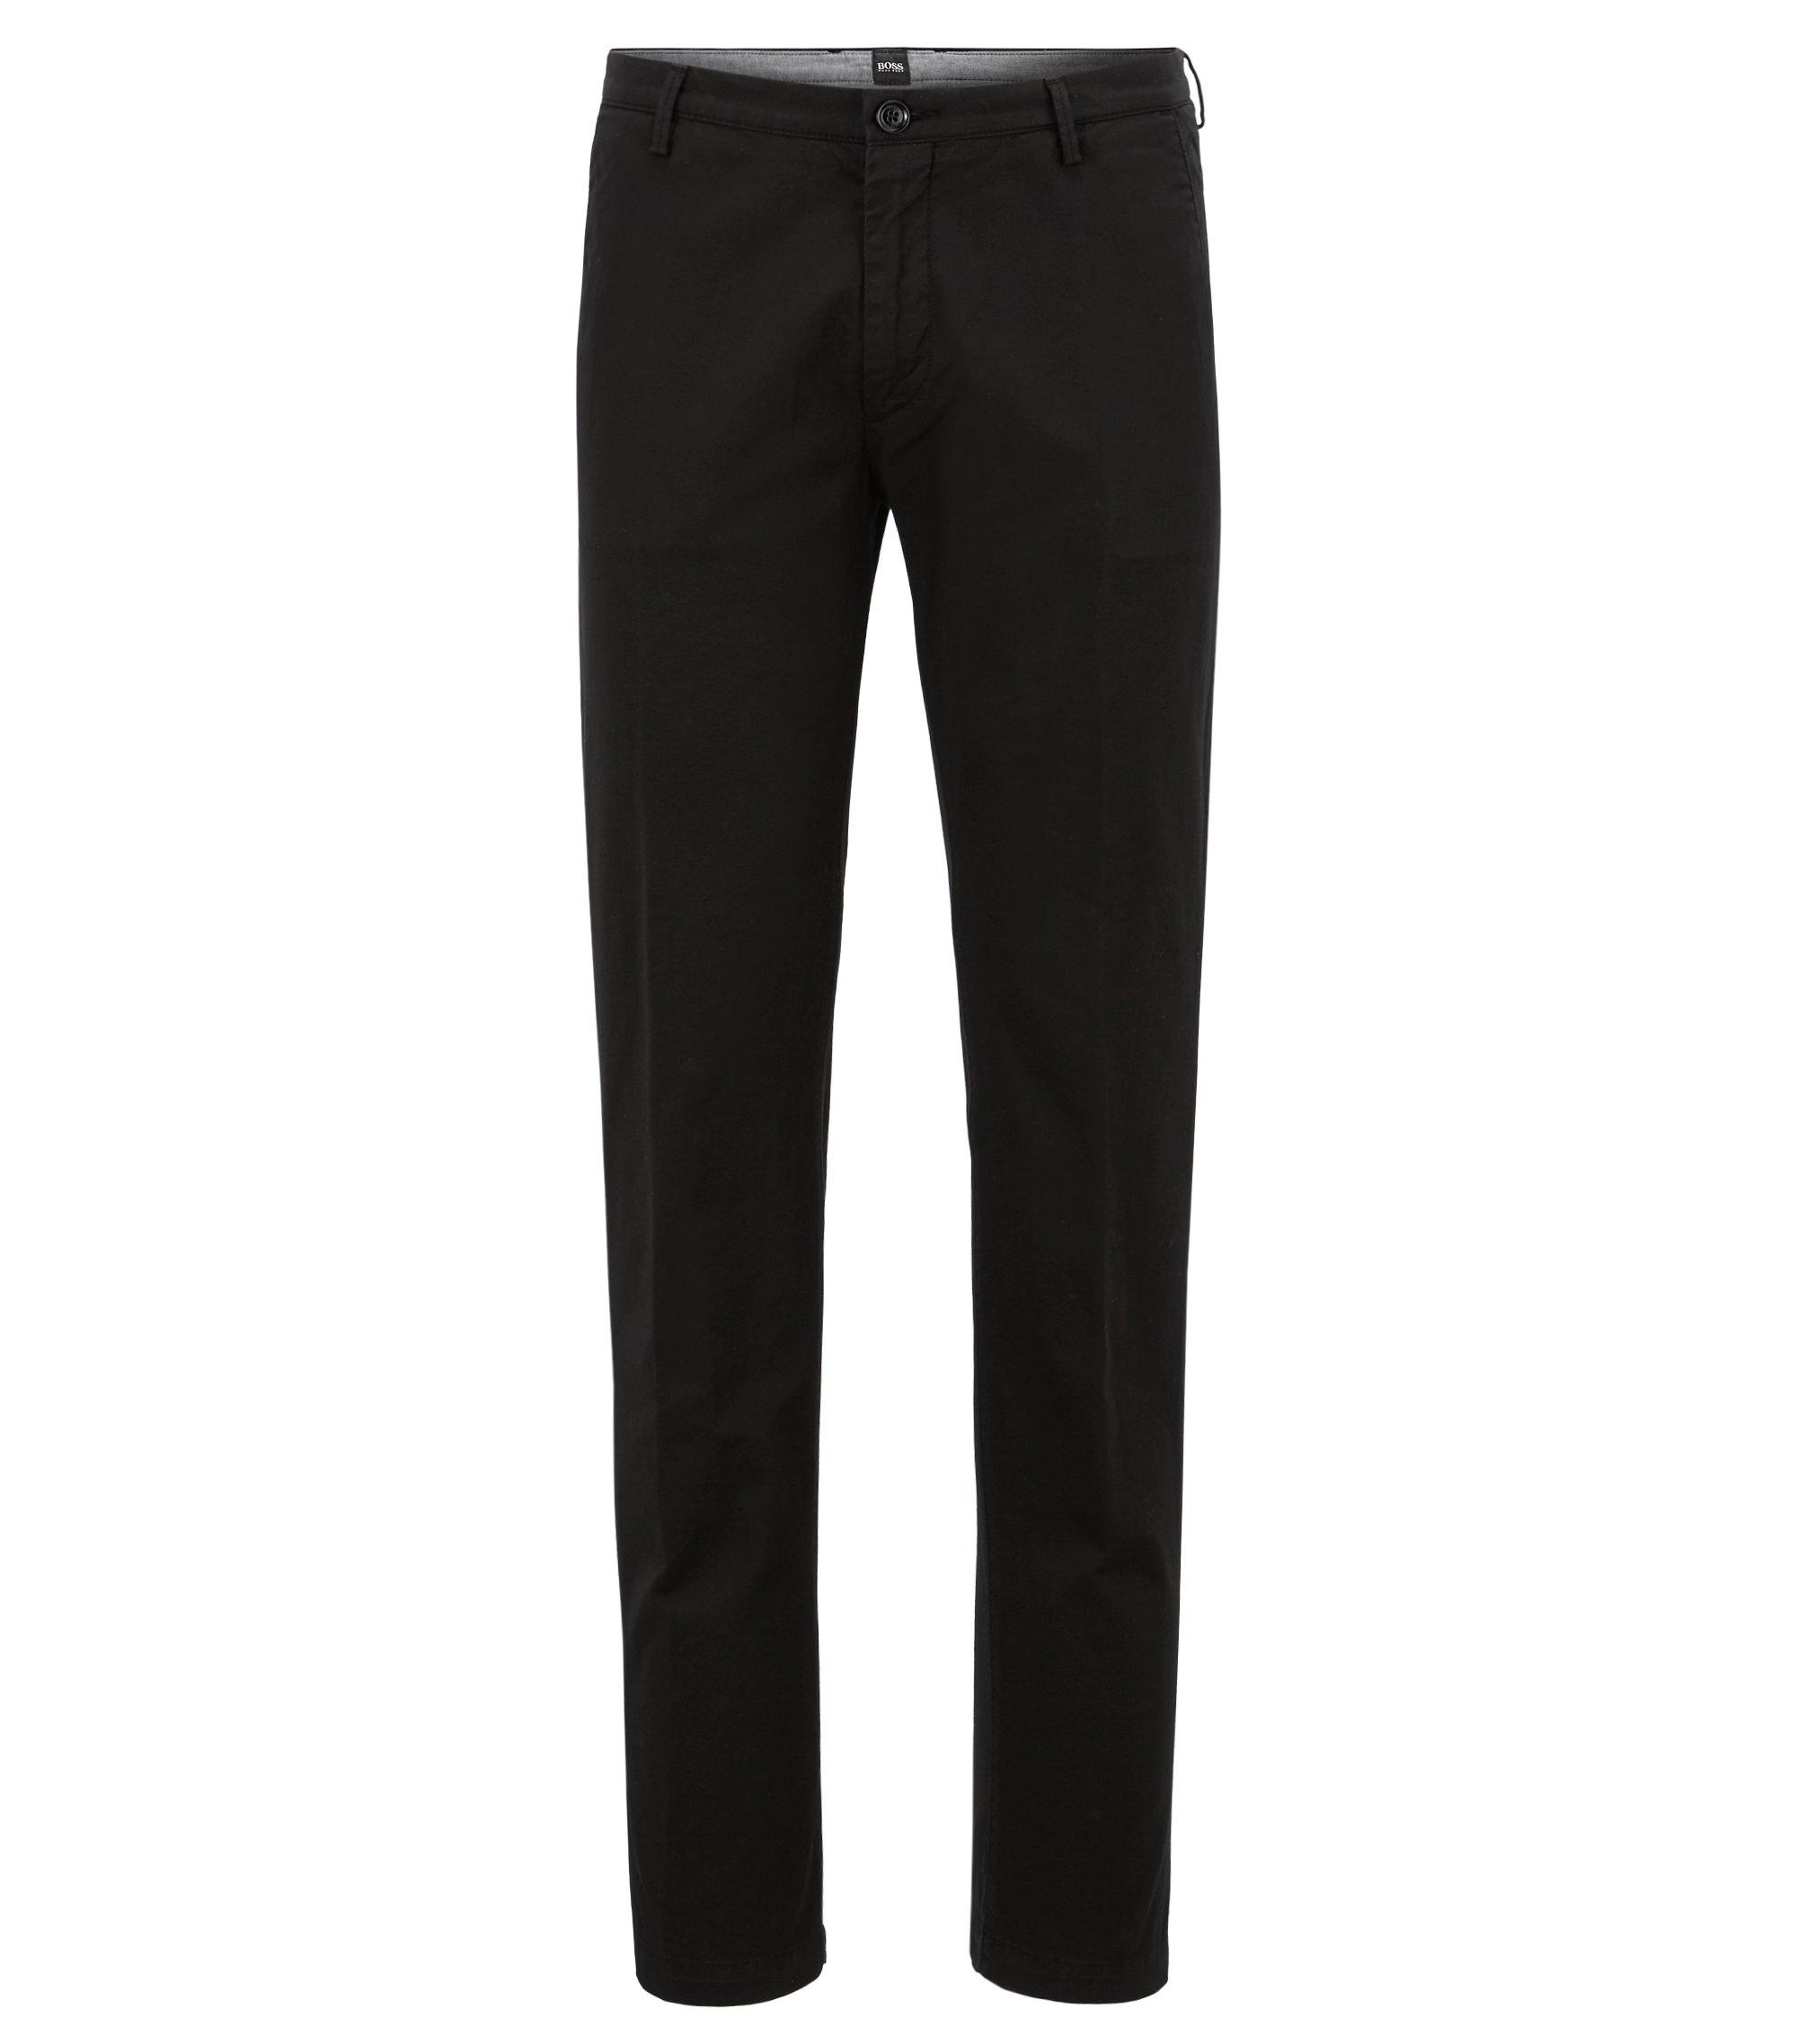 Cotton Stretch Chino Pant, Slim Fit | Rice D, Black